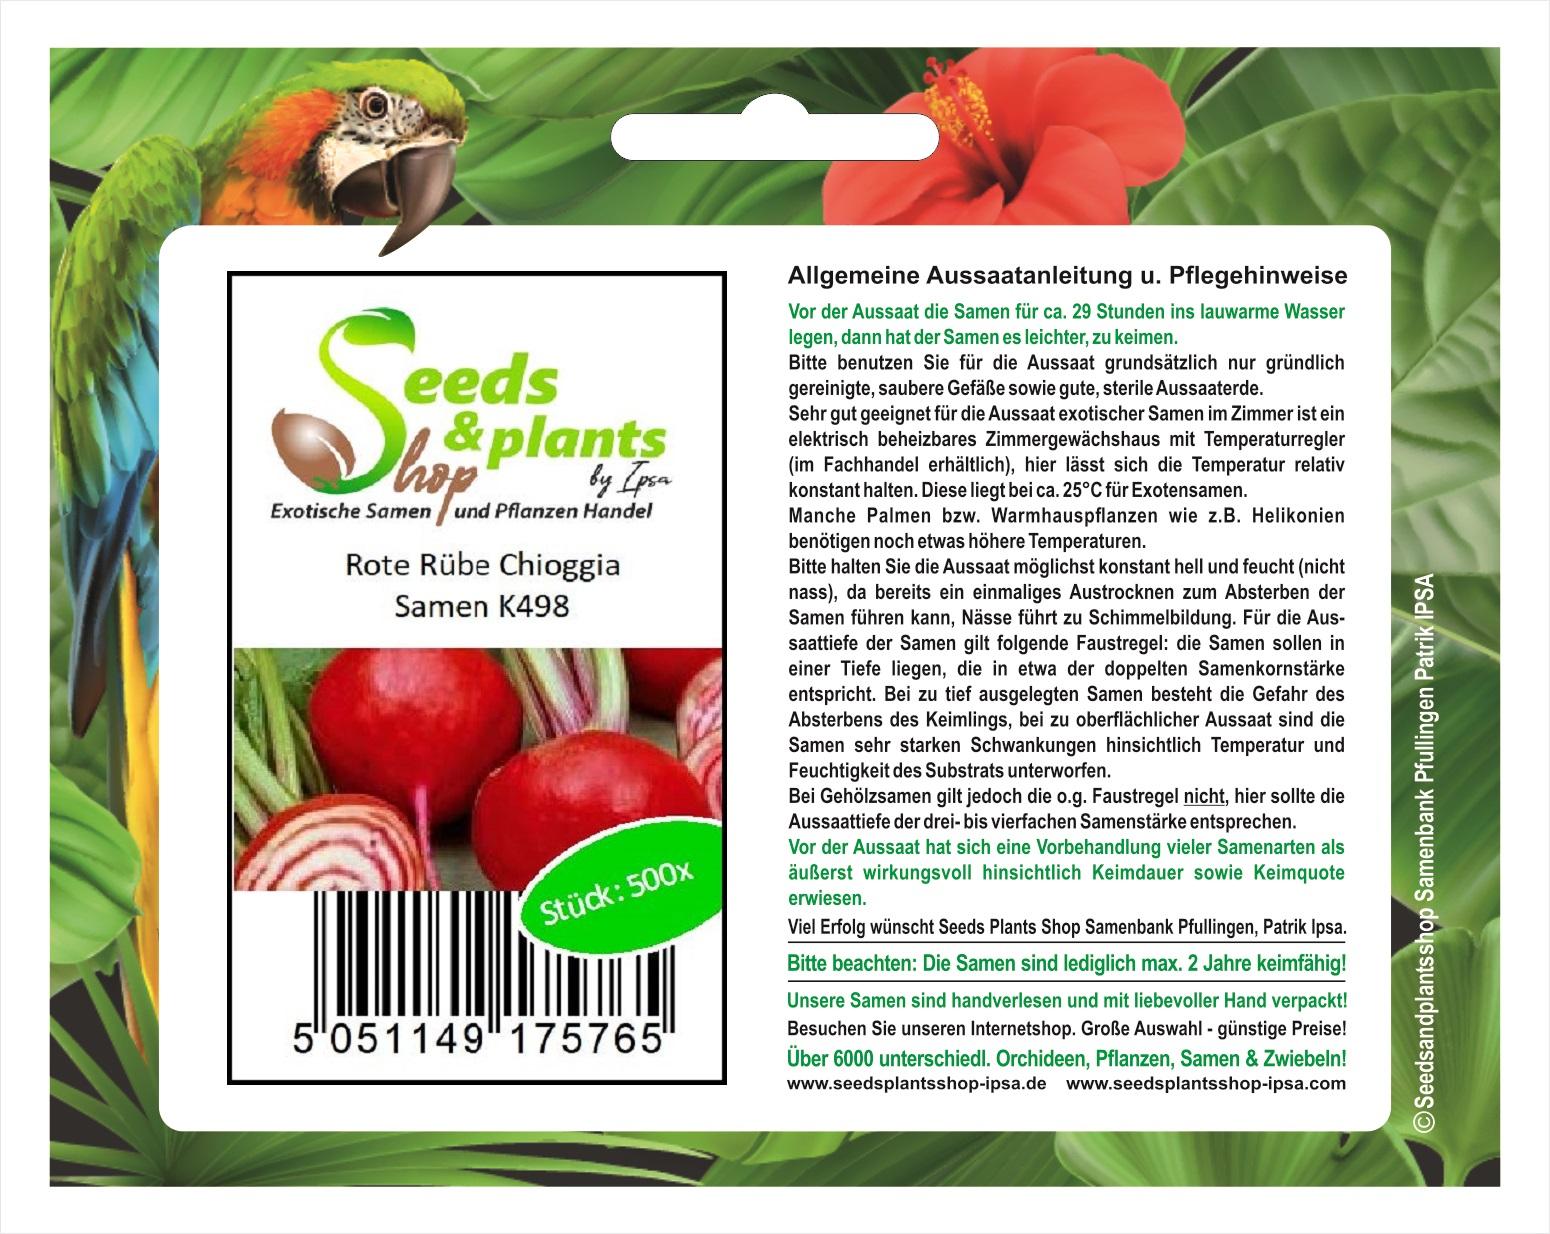 30x Rote Rübe Chioggia-Rüben samen Gemüse KS498